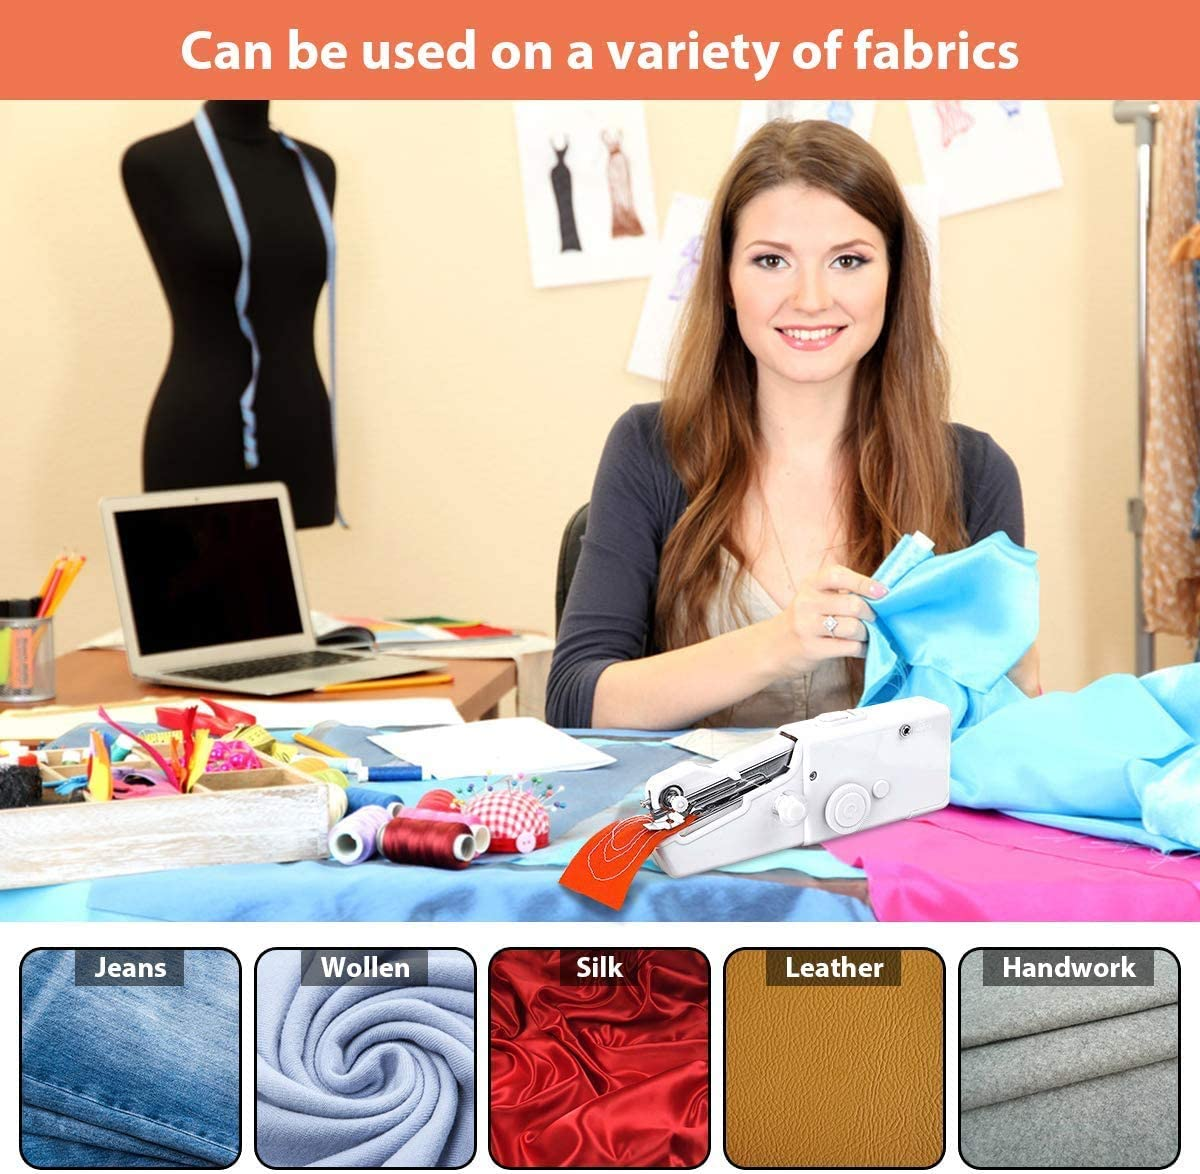 futureyun Mini Handheld Sewing Machine Machine Electric Stitch Tool for Fabric Quick Repairing Suitable for Clothing